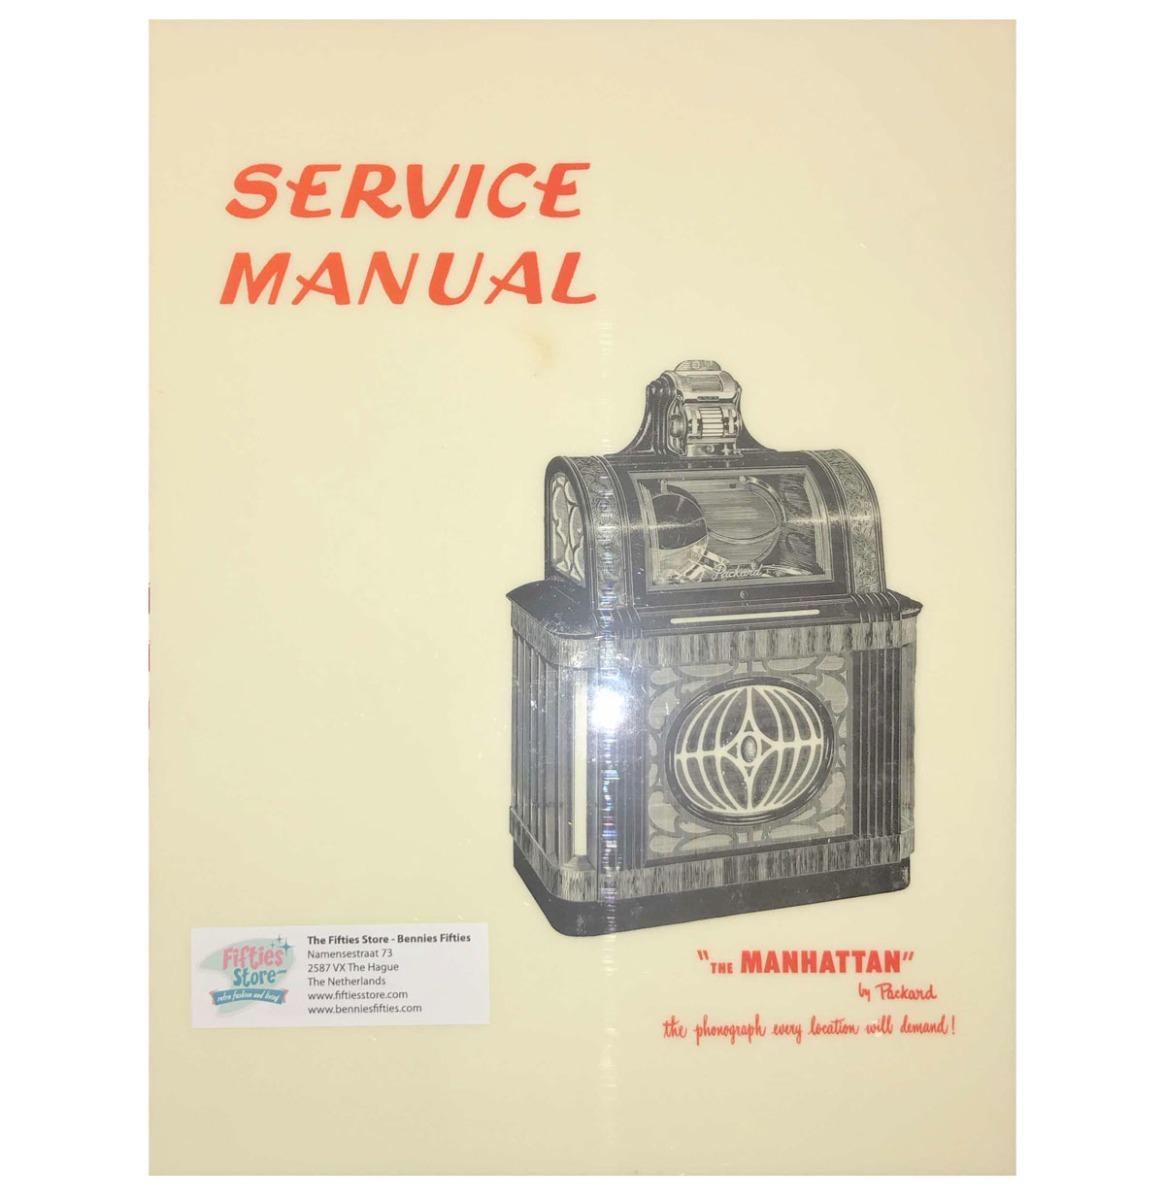 Packard Manhattan Jukebox Service Manual